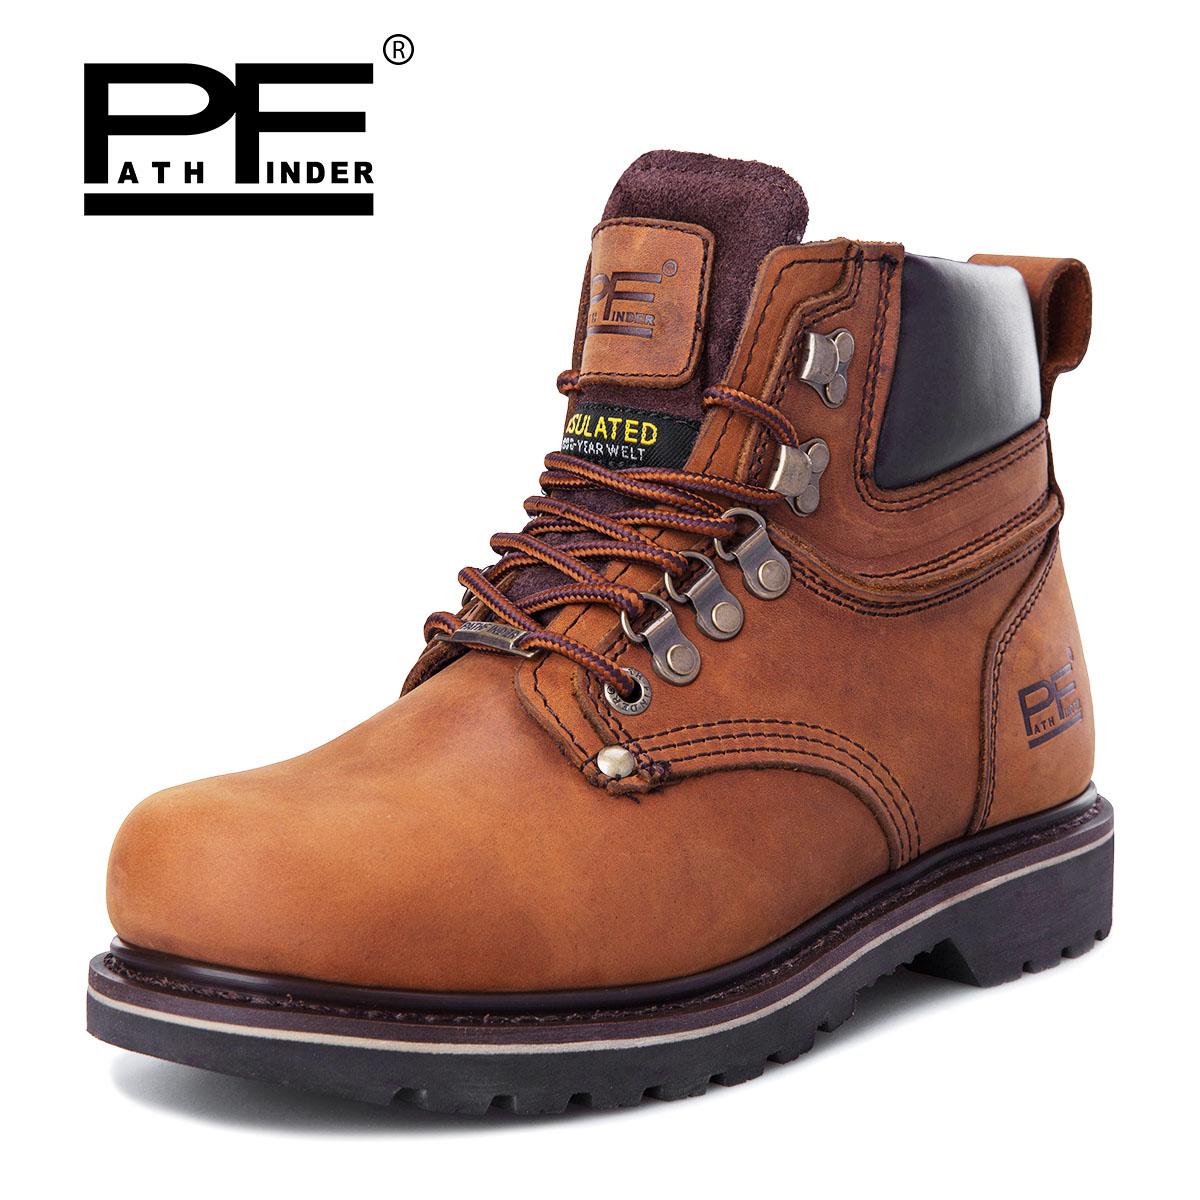 PF美式复古潮流工装靴户外休闲登山鞋短筒皮靴大头男靴PathFinder